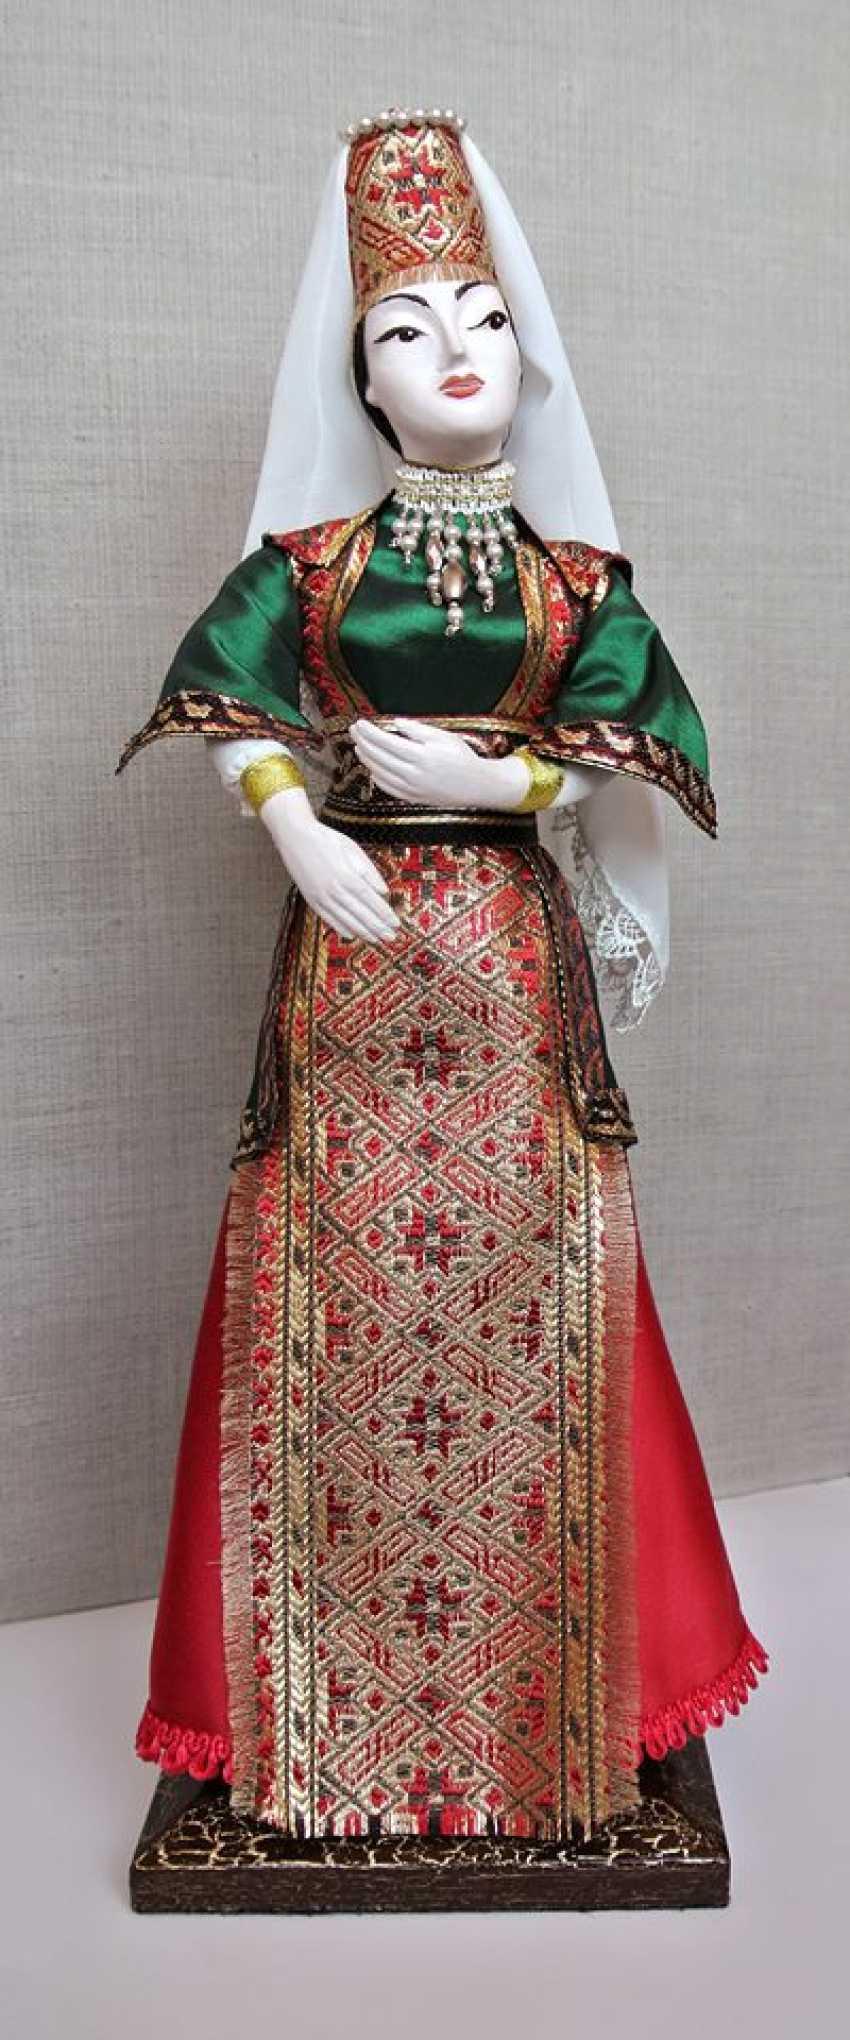 Karine Yeghiazaryan. Poupée de collection dans l'costume national - photo 1